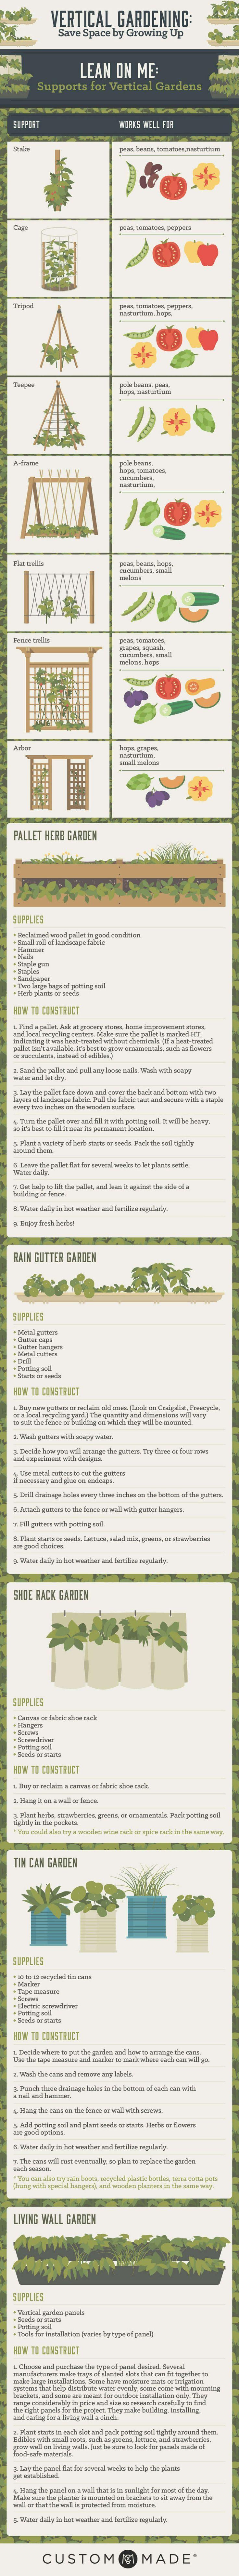 Infographic: How to Grow A Vertical Garden